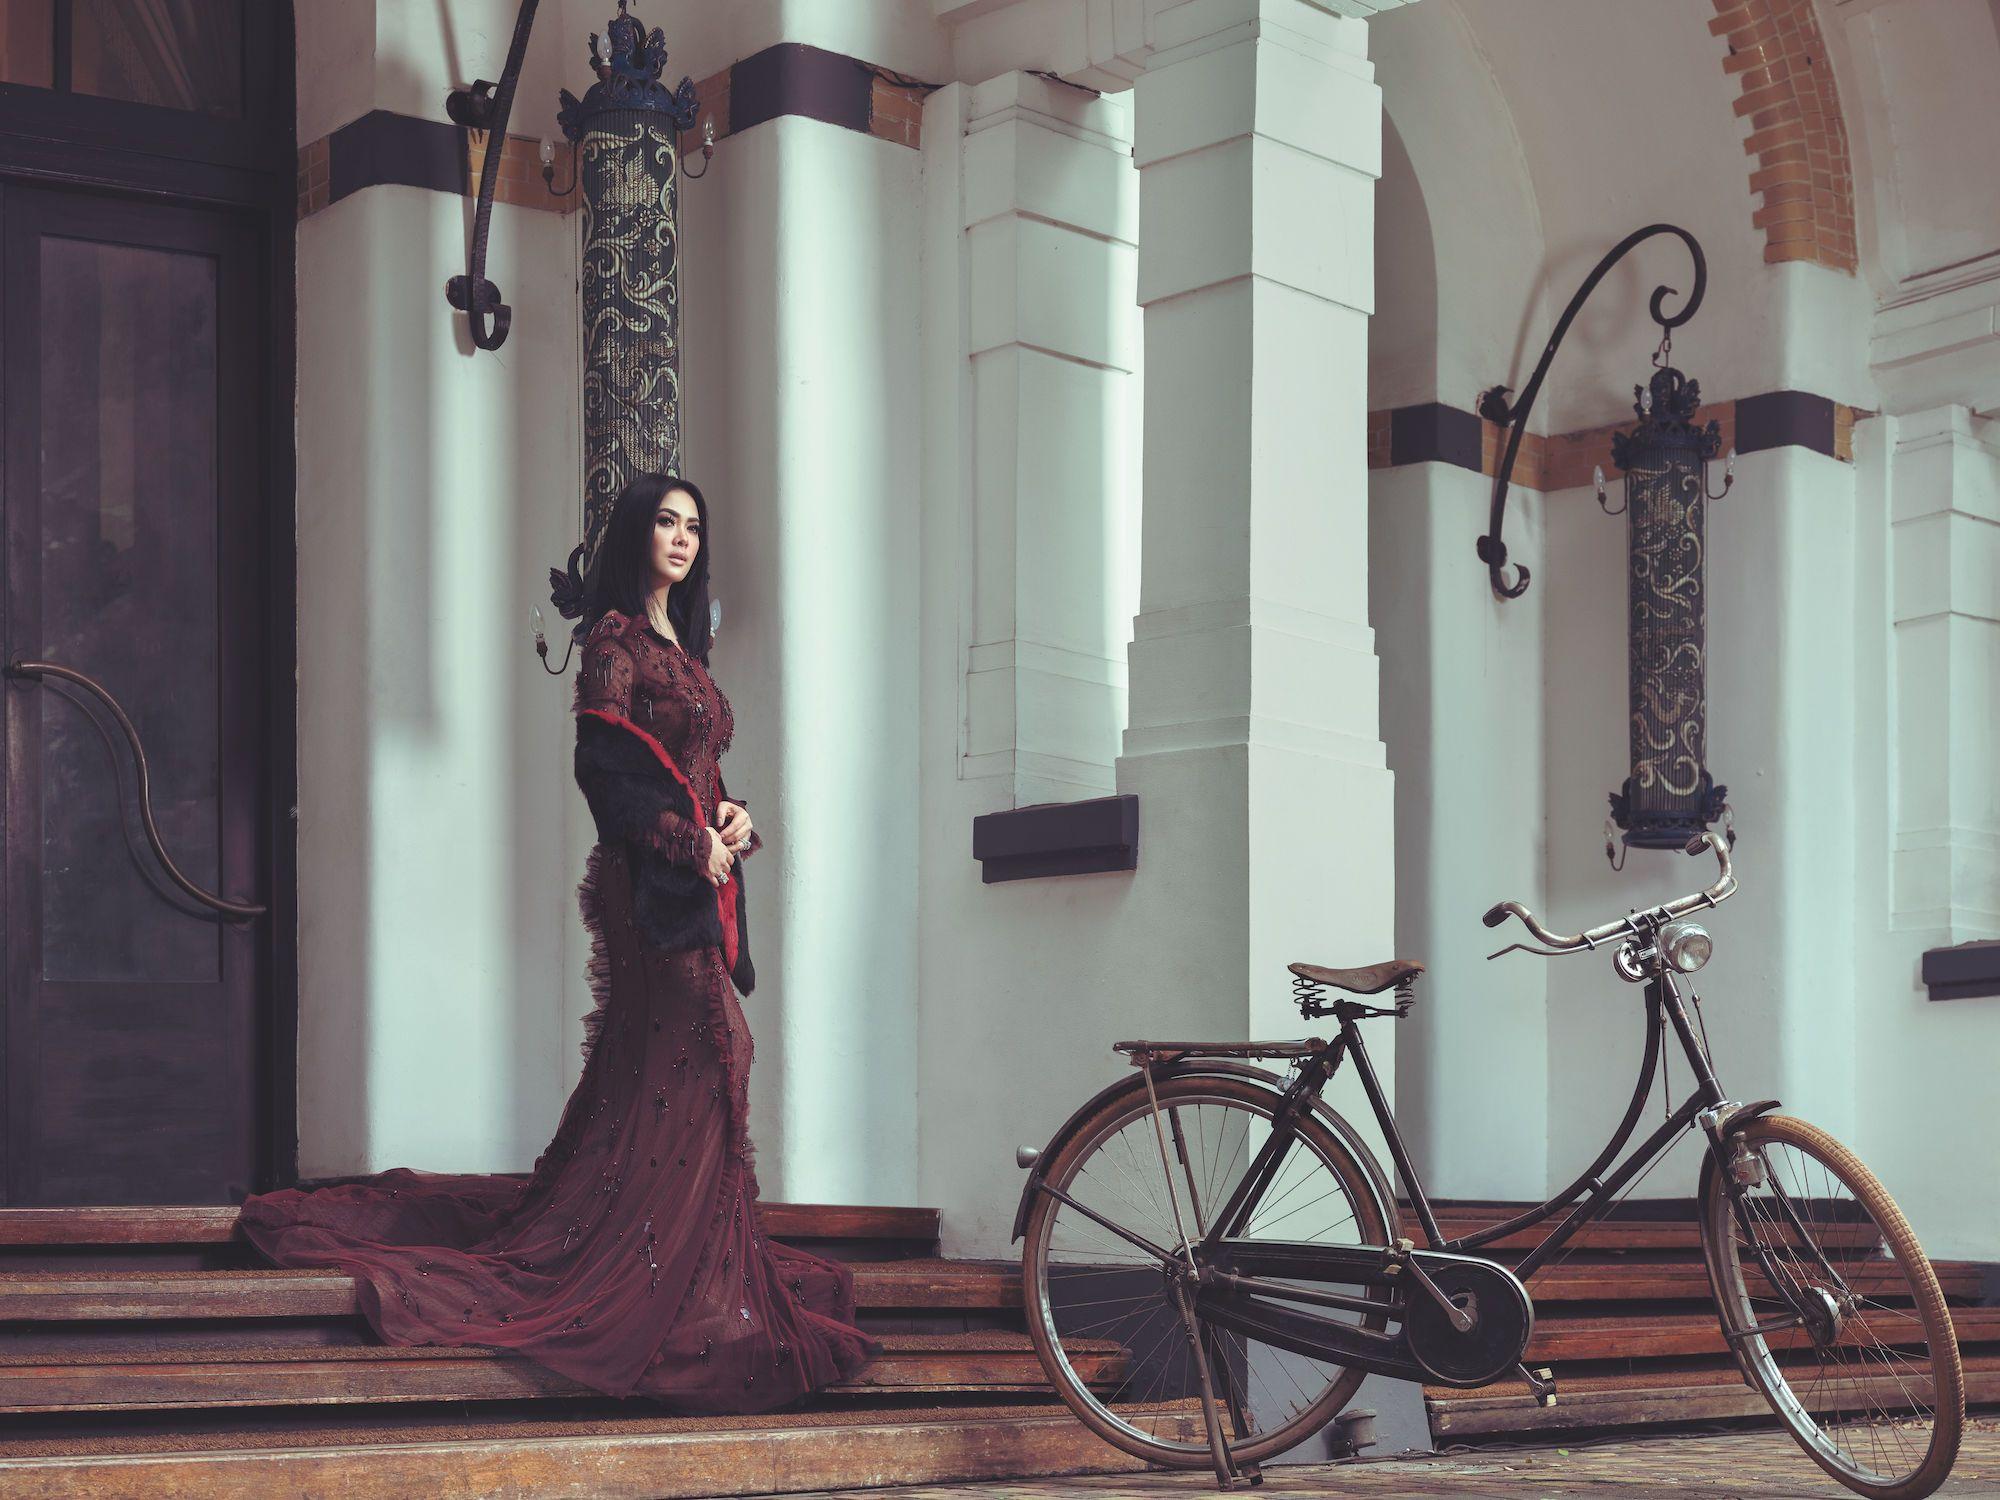 Source: Raja Siregar for Indonesia Tatler